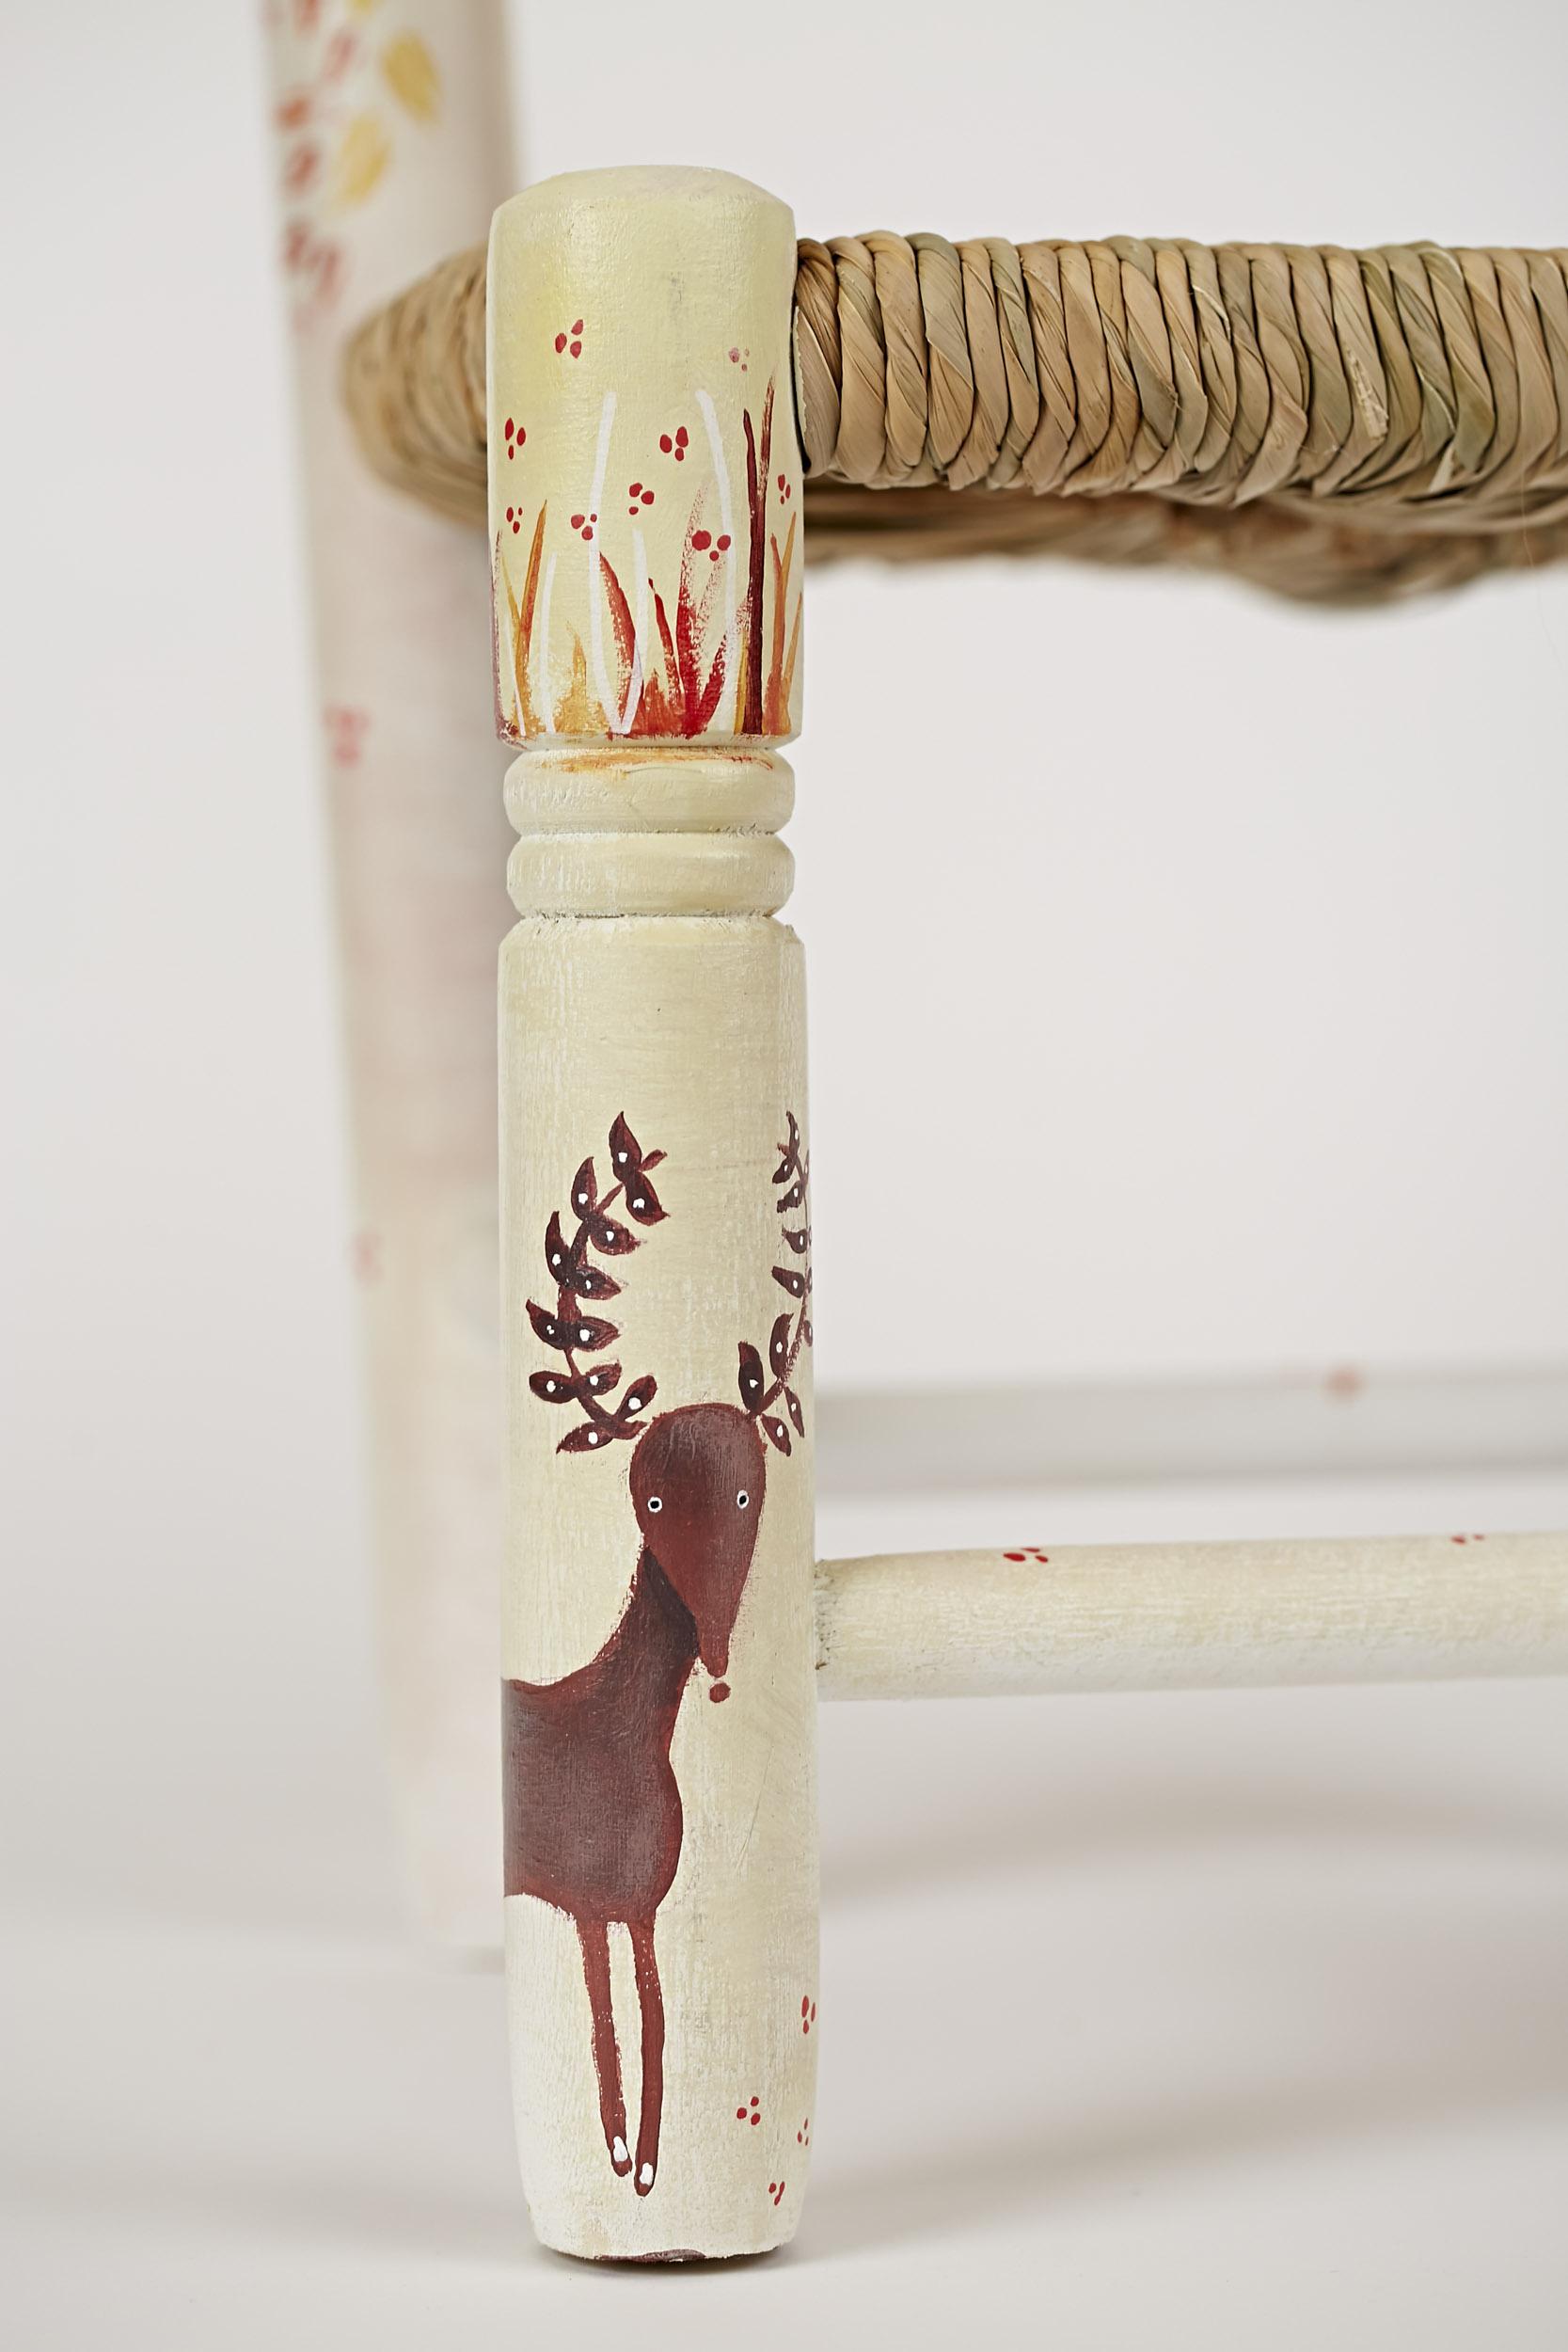 Volianna-cadireta-cérvol-pota.jpg